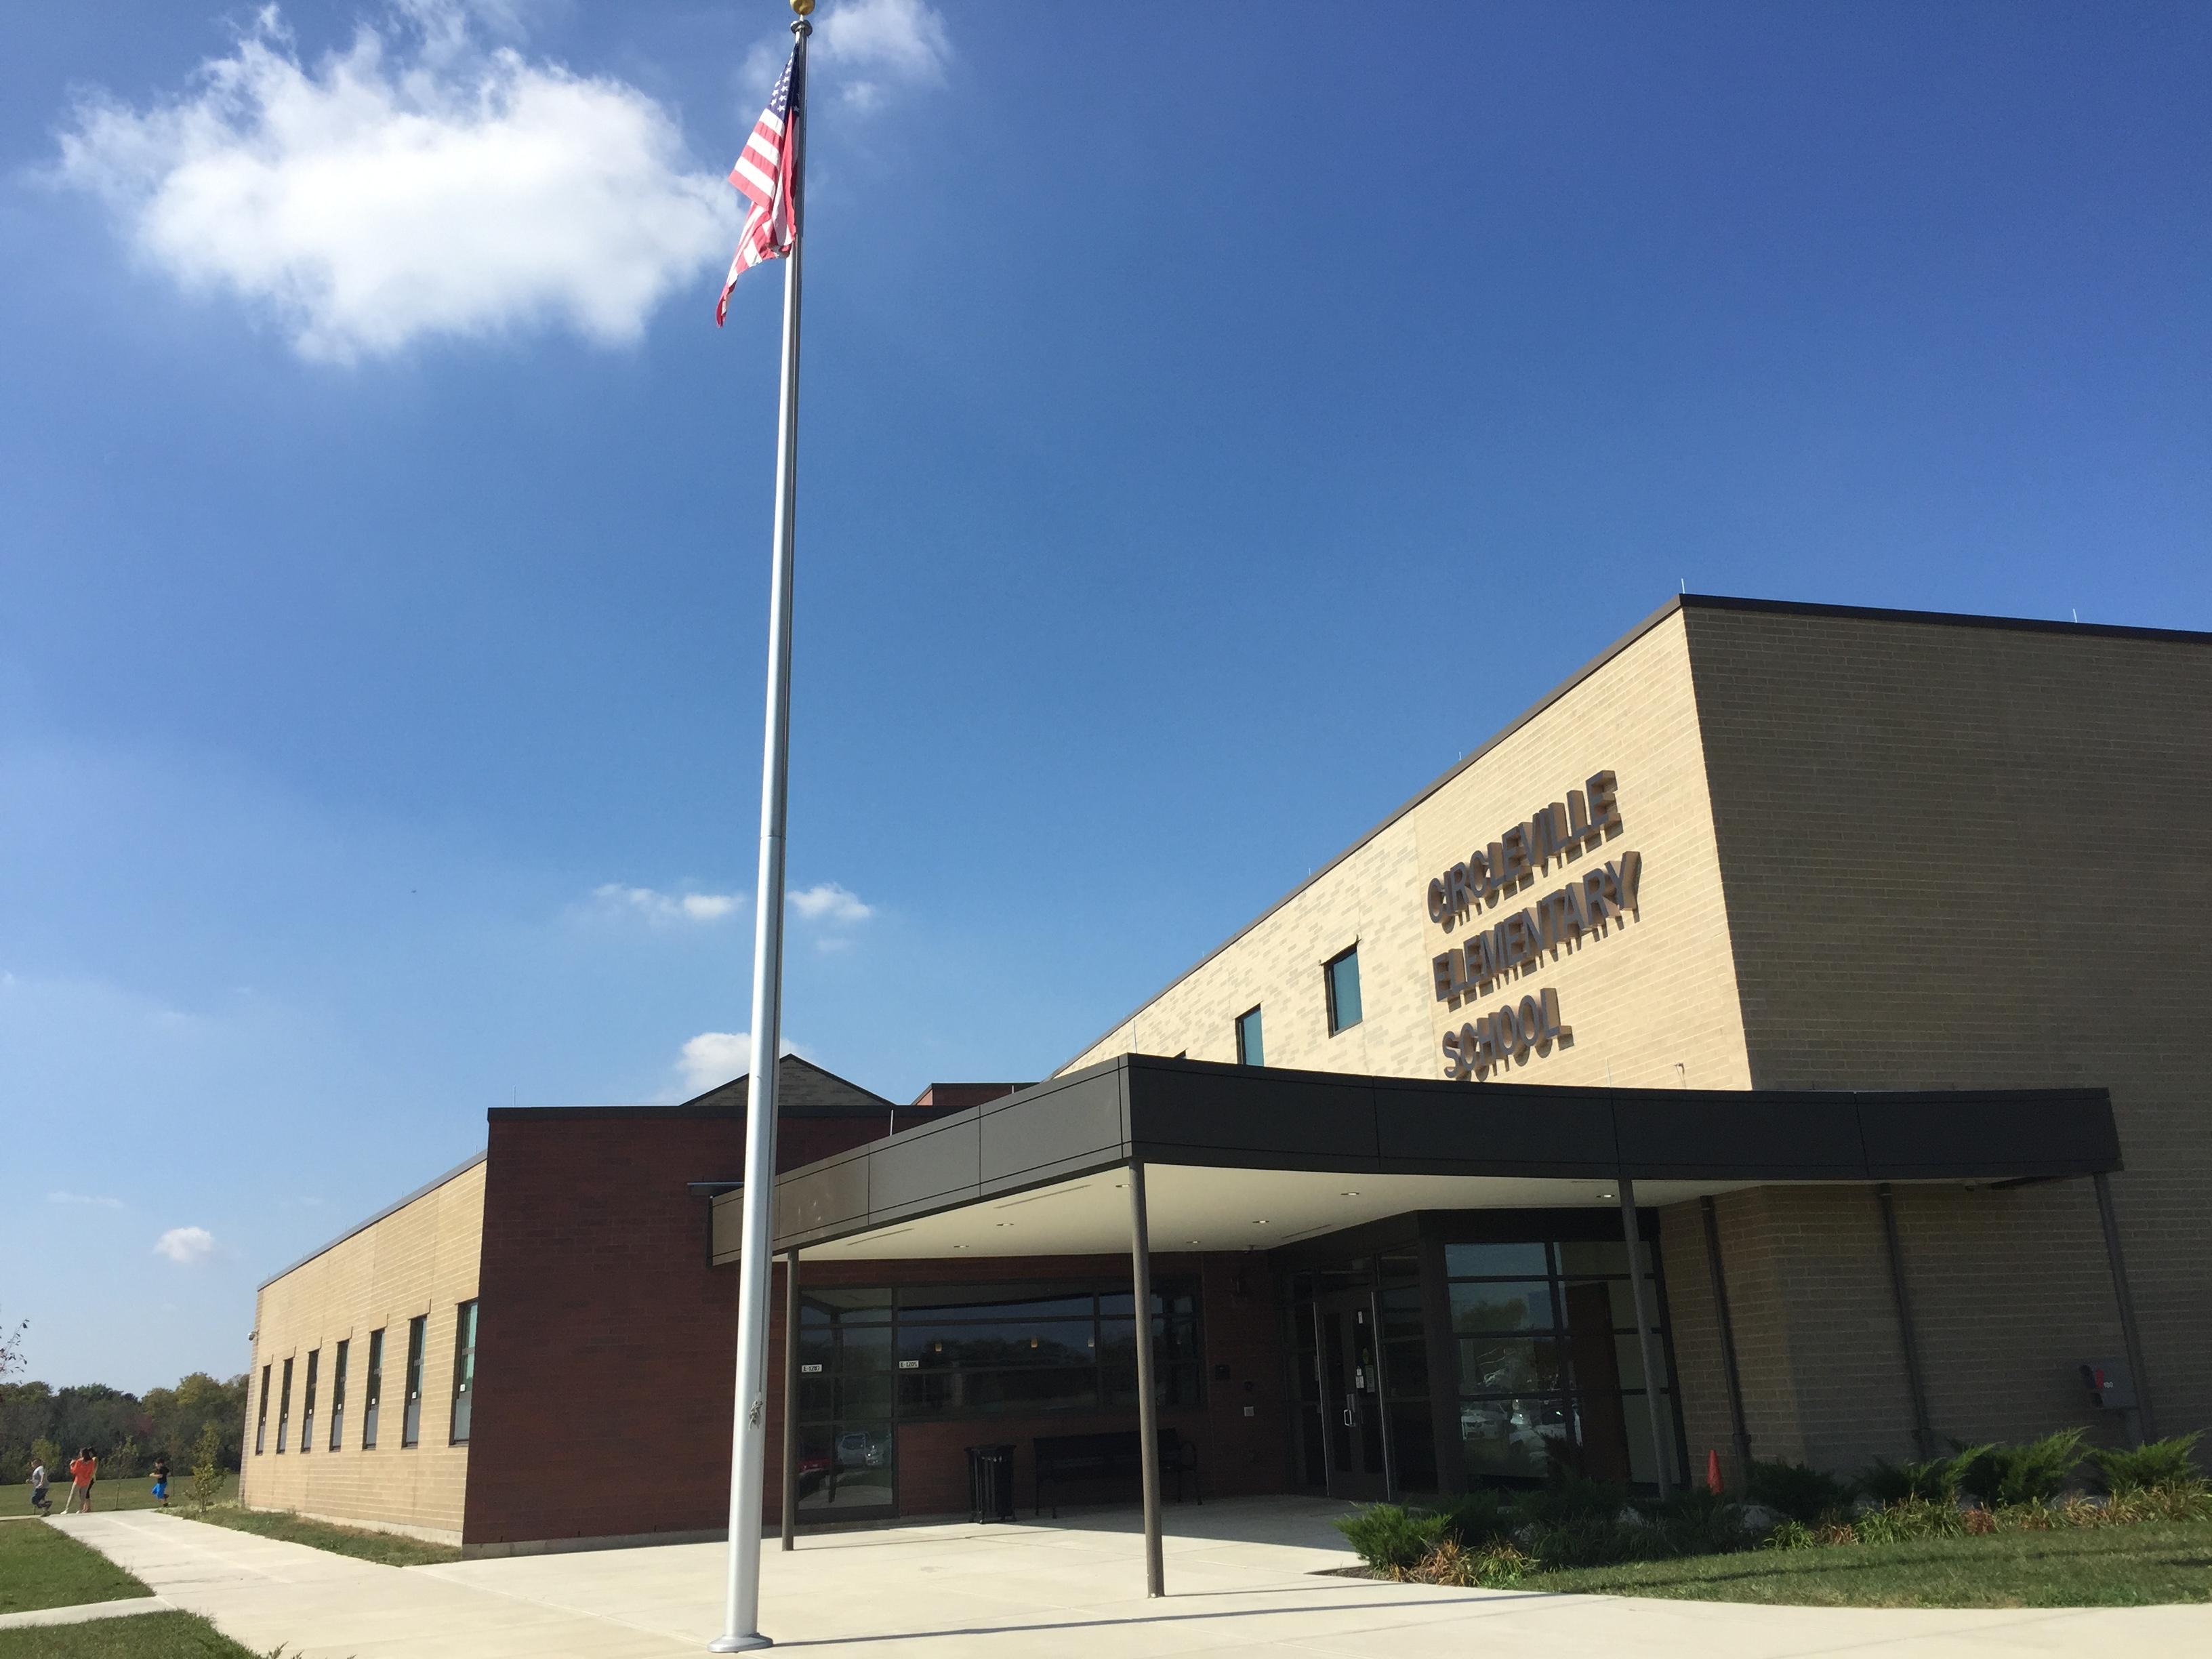 Circleville Elementary School